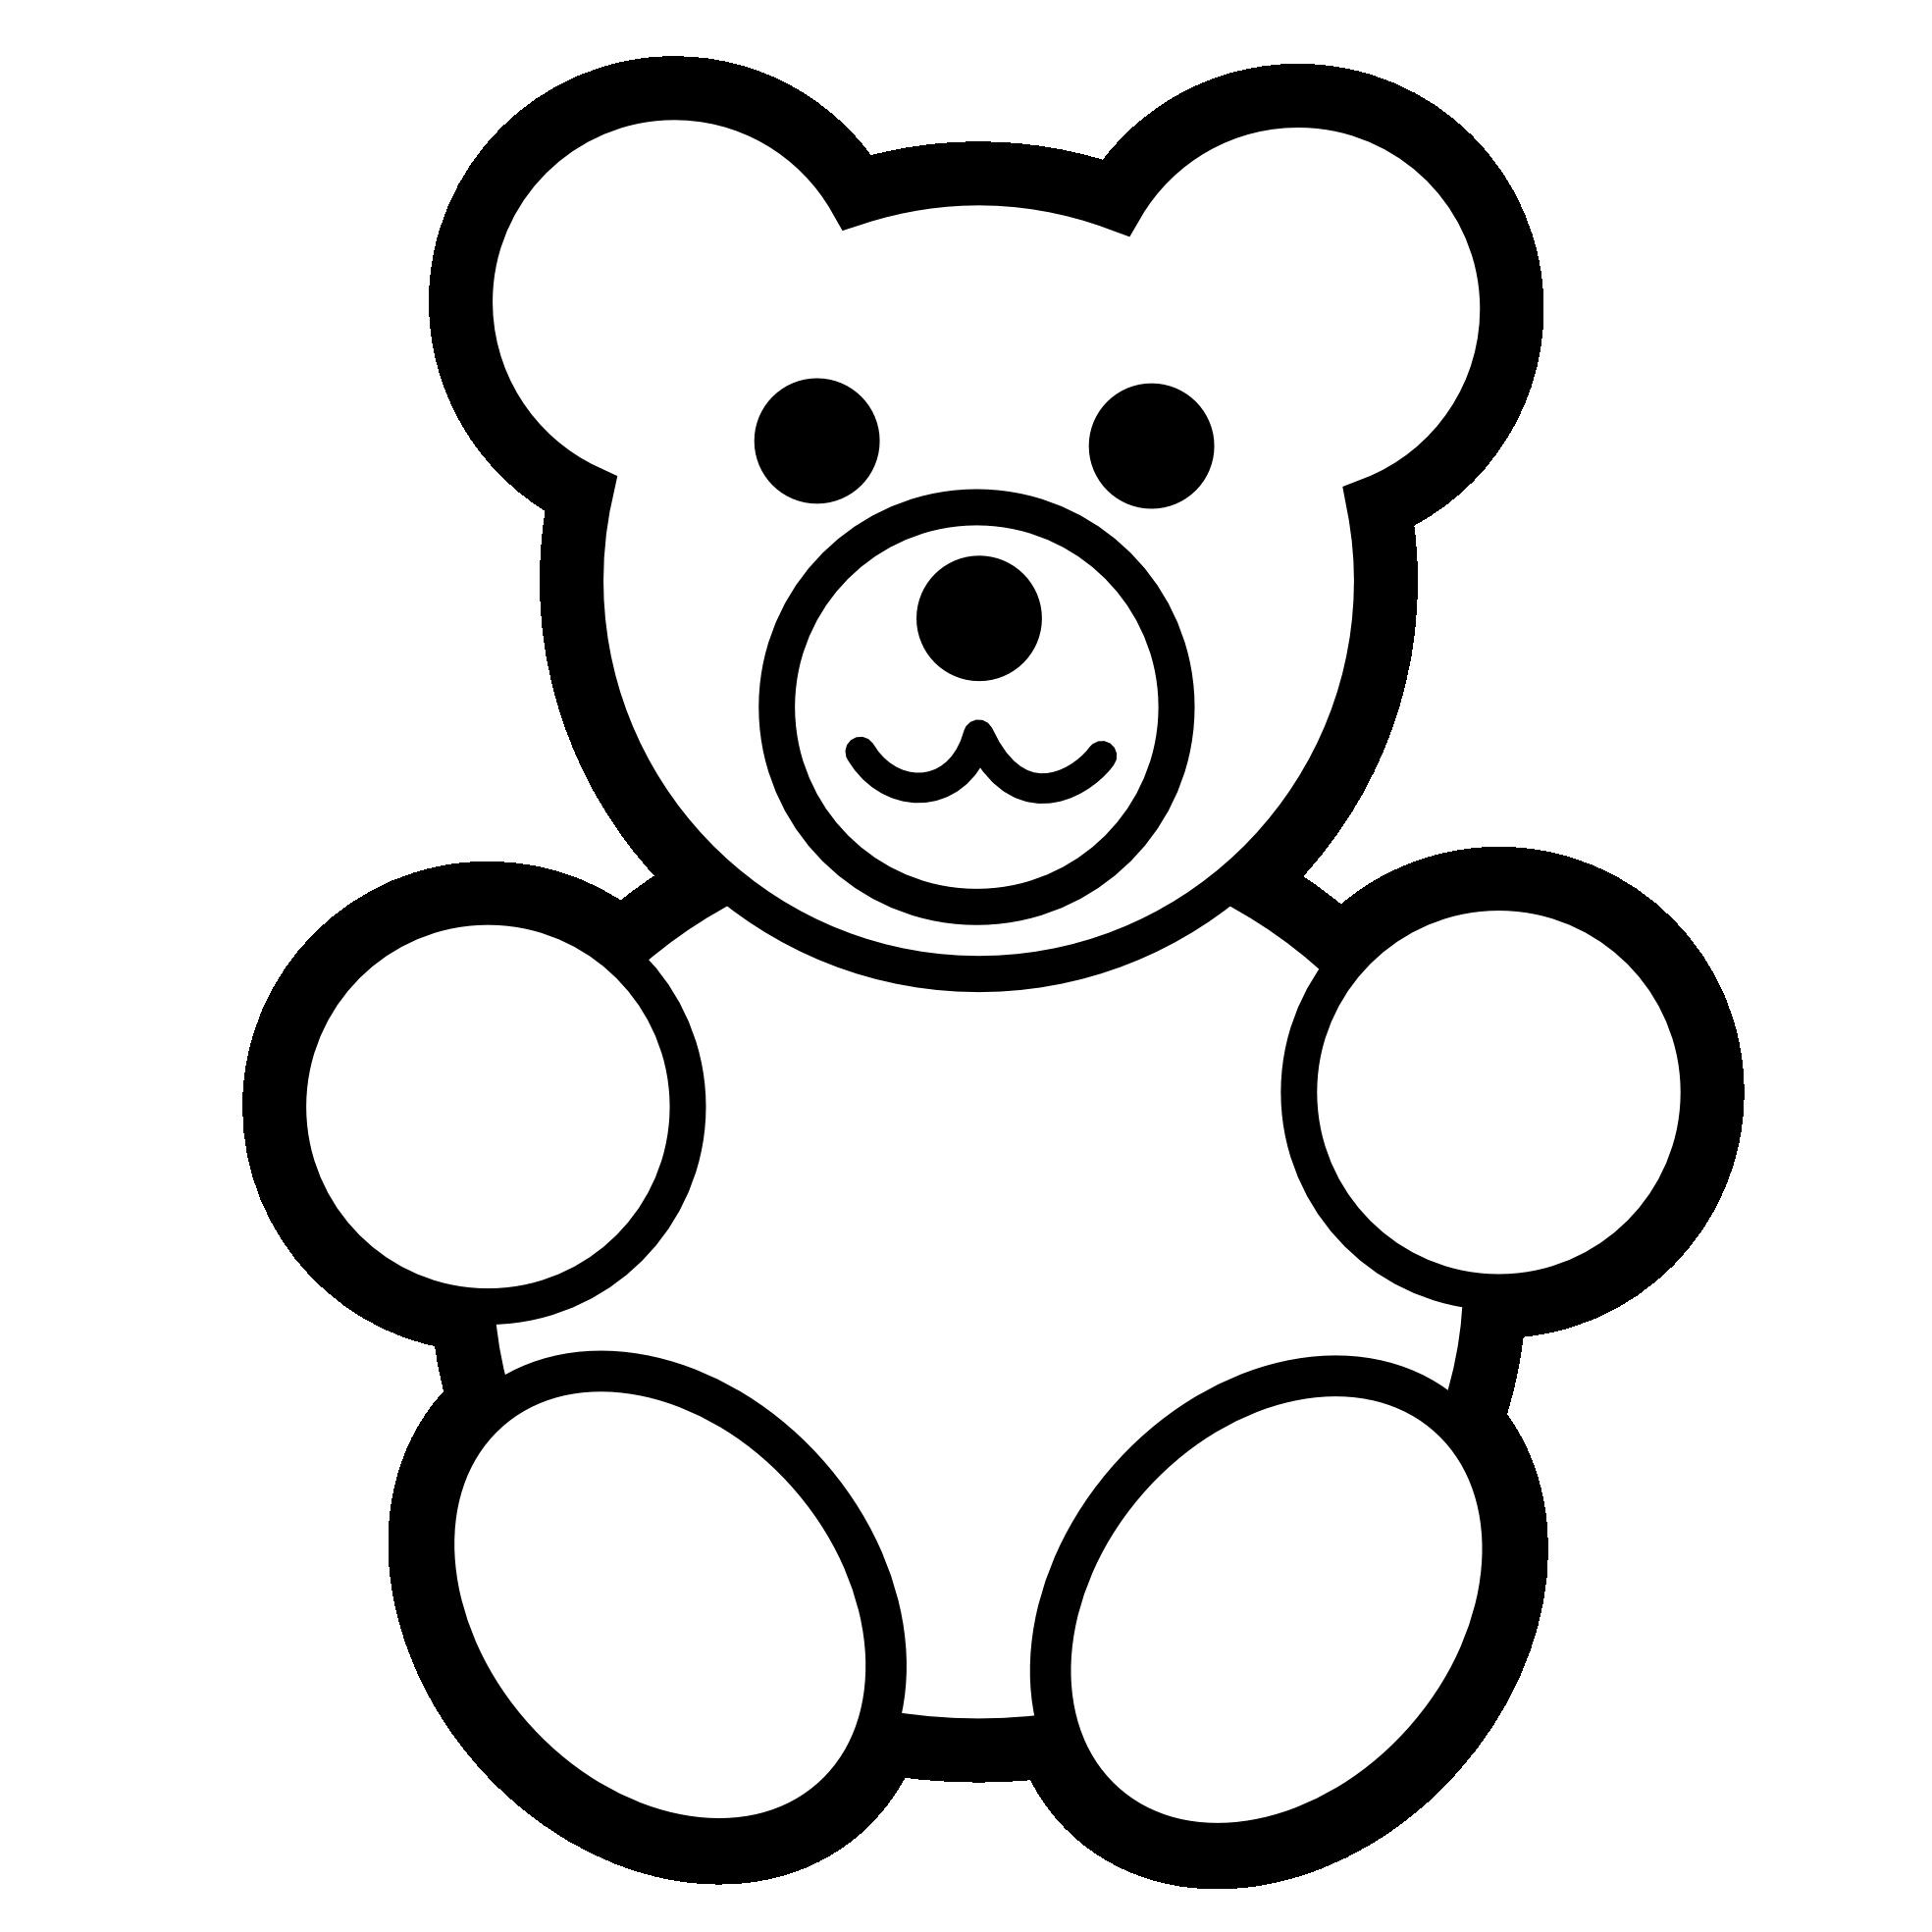 Paw clipart black bear White Teddy Teddy With Black